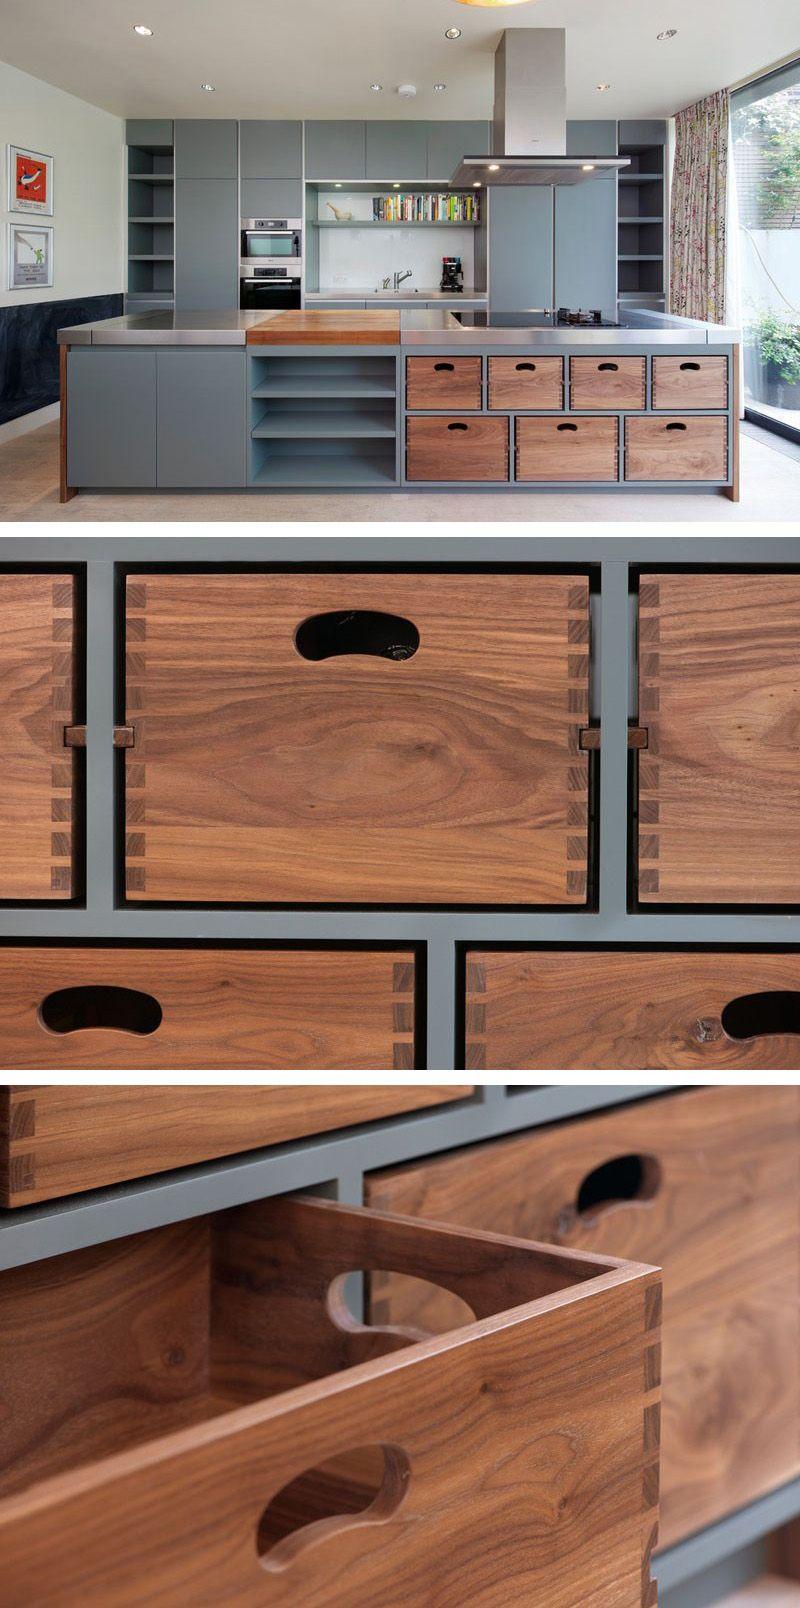 hauswirtschaftsraum moebel pinterest. Black Bedroom Furniture Sets. Home Design Ideas